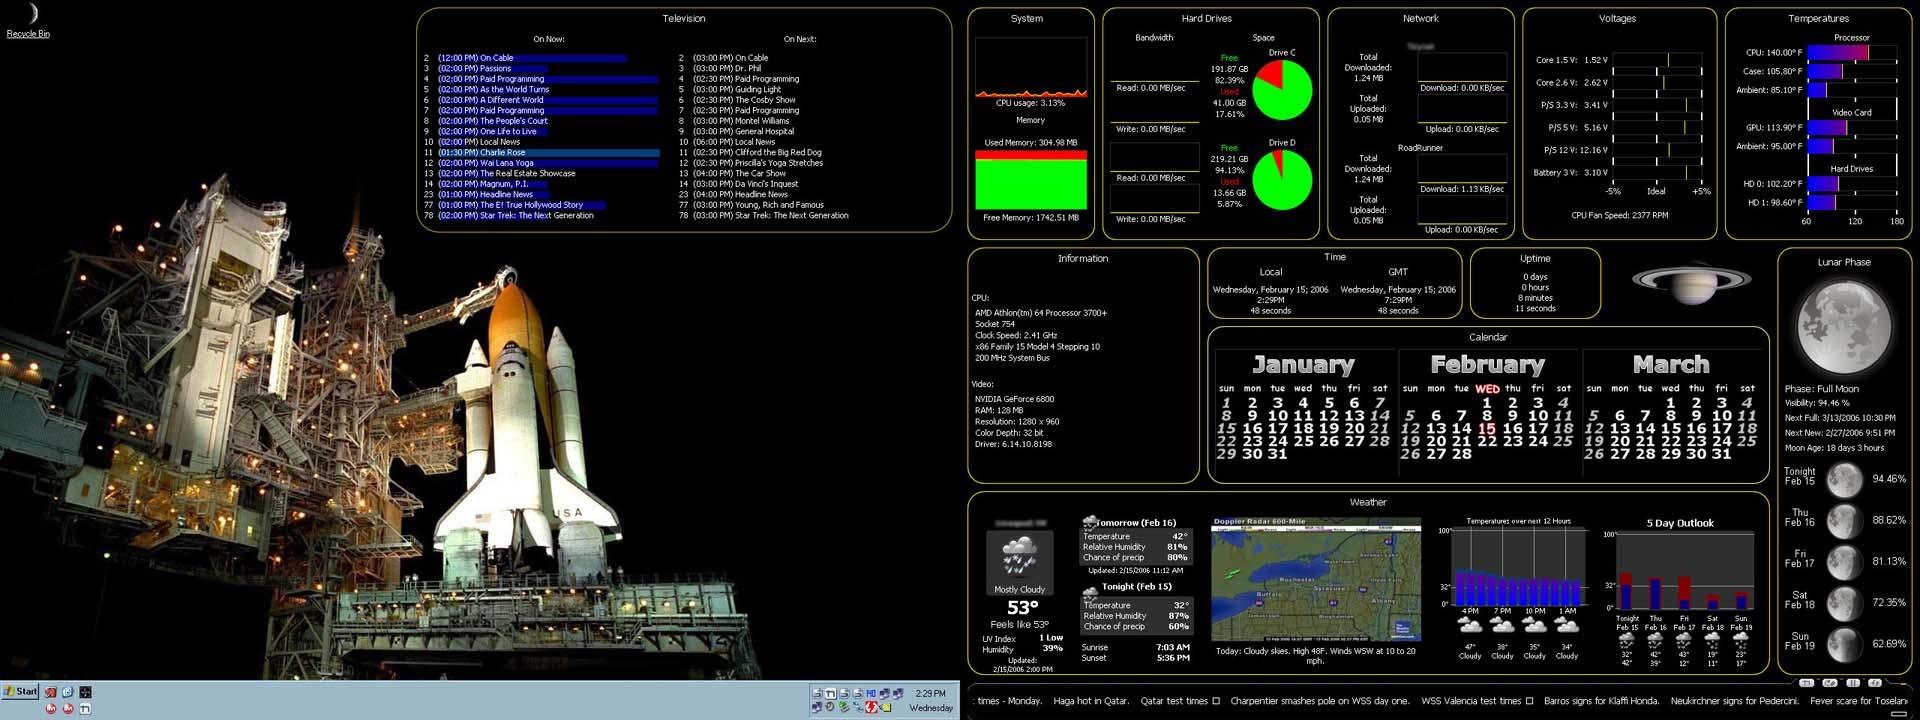 Title: Waldron's 32-bit desktop